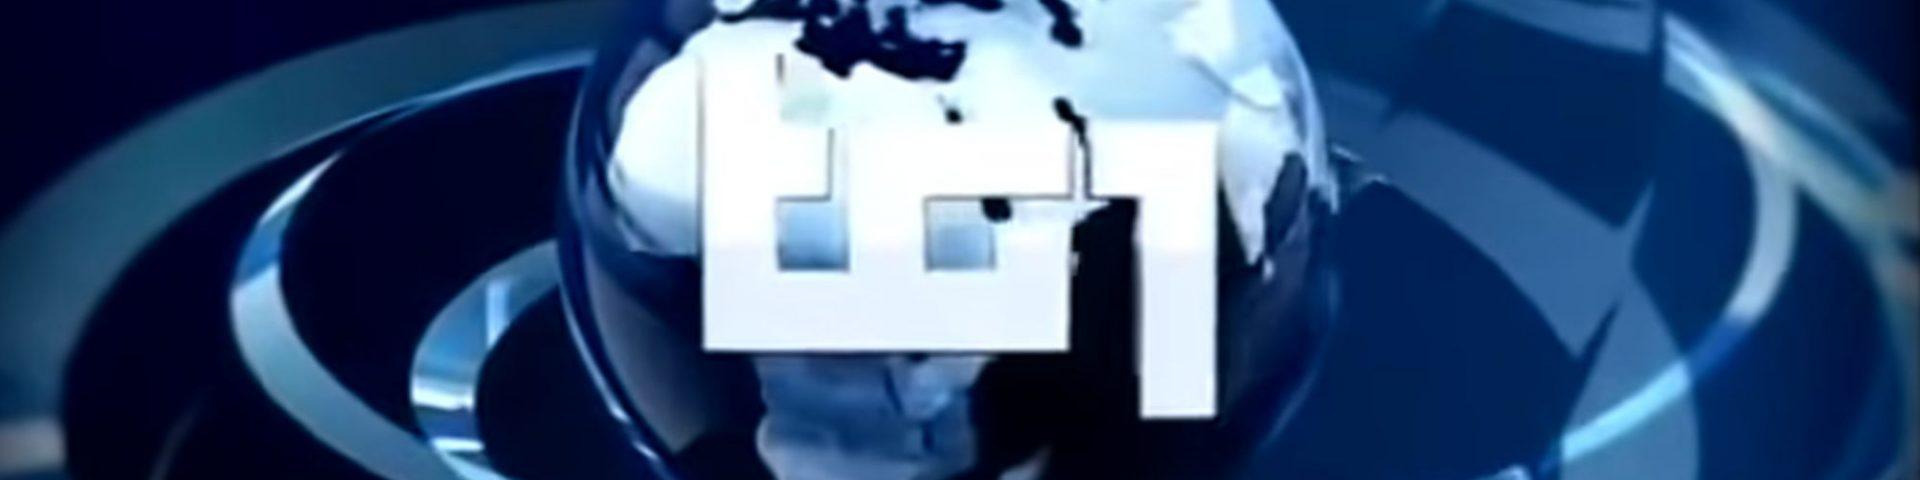 Sigla TG1: canzone e accordi (Video)